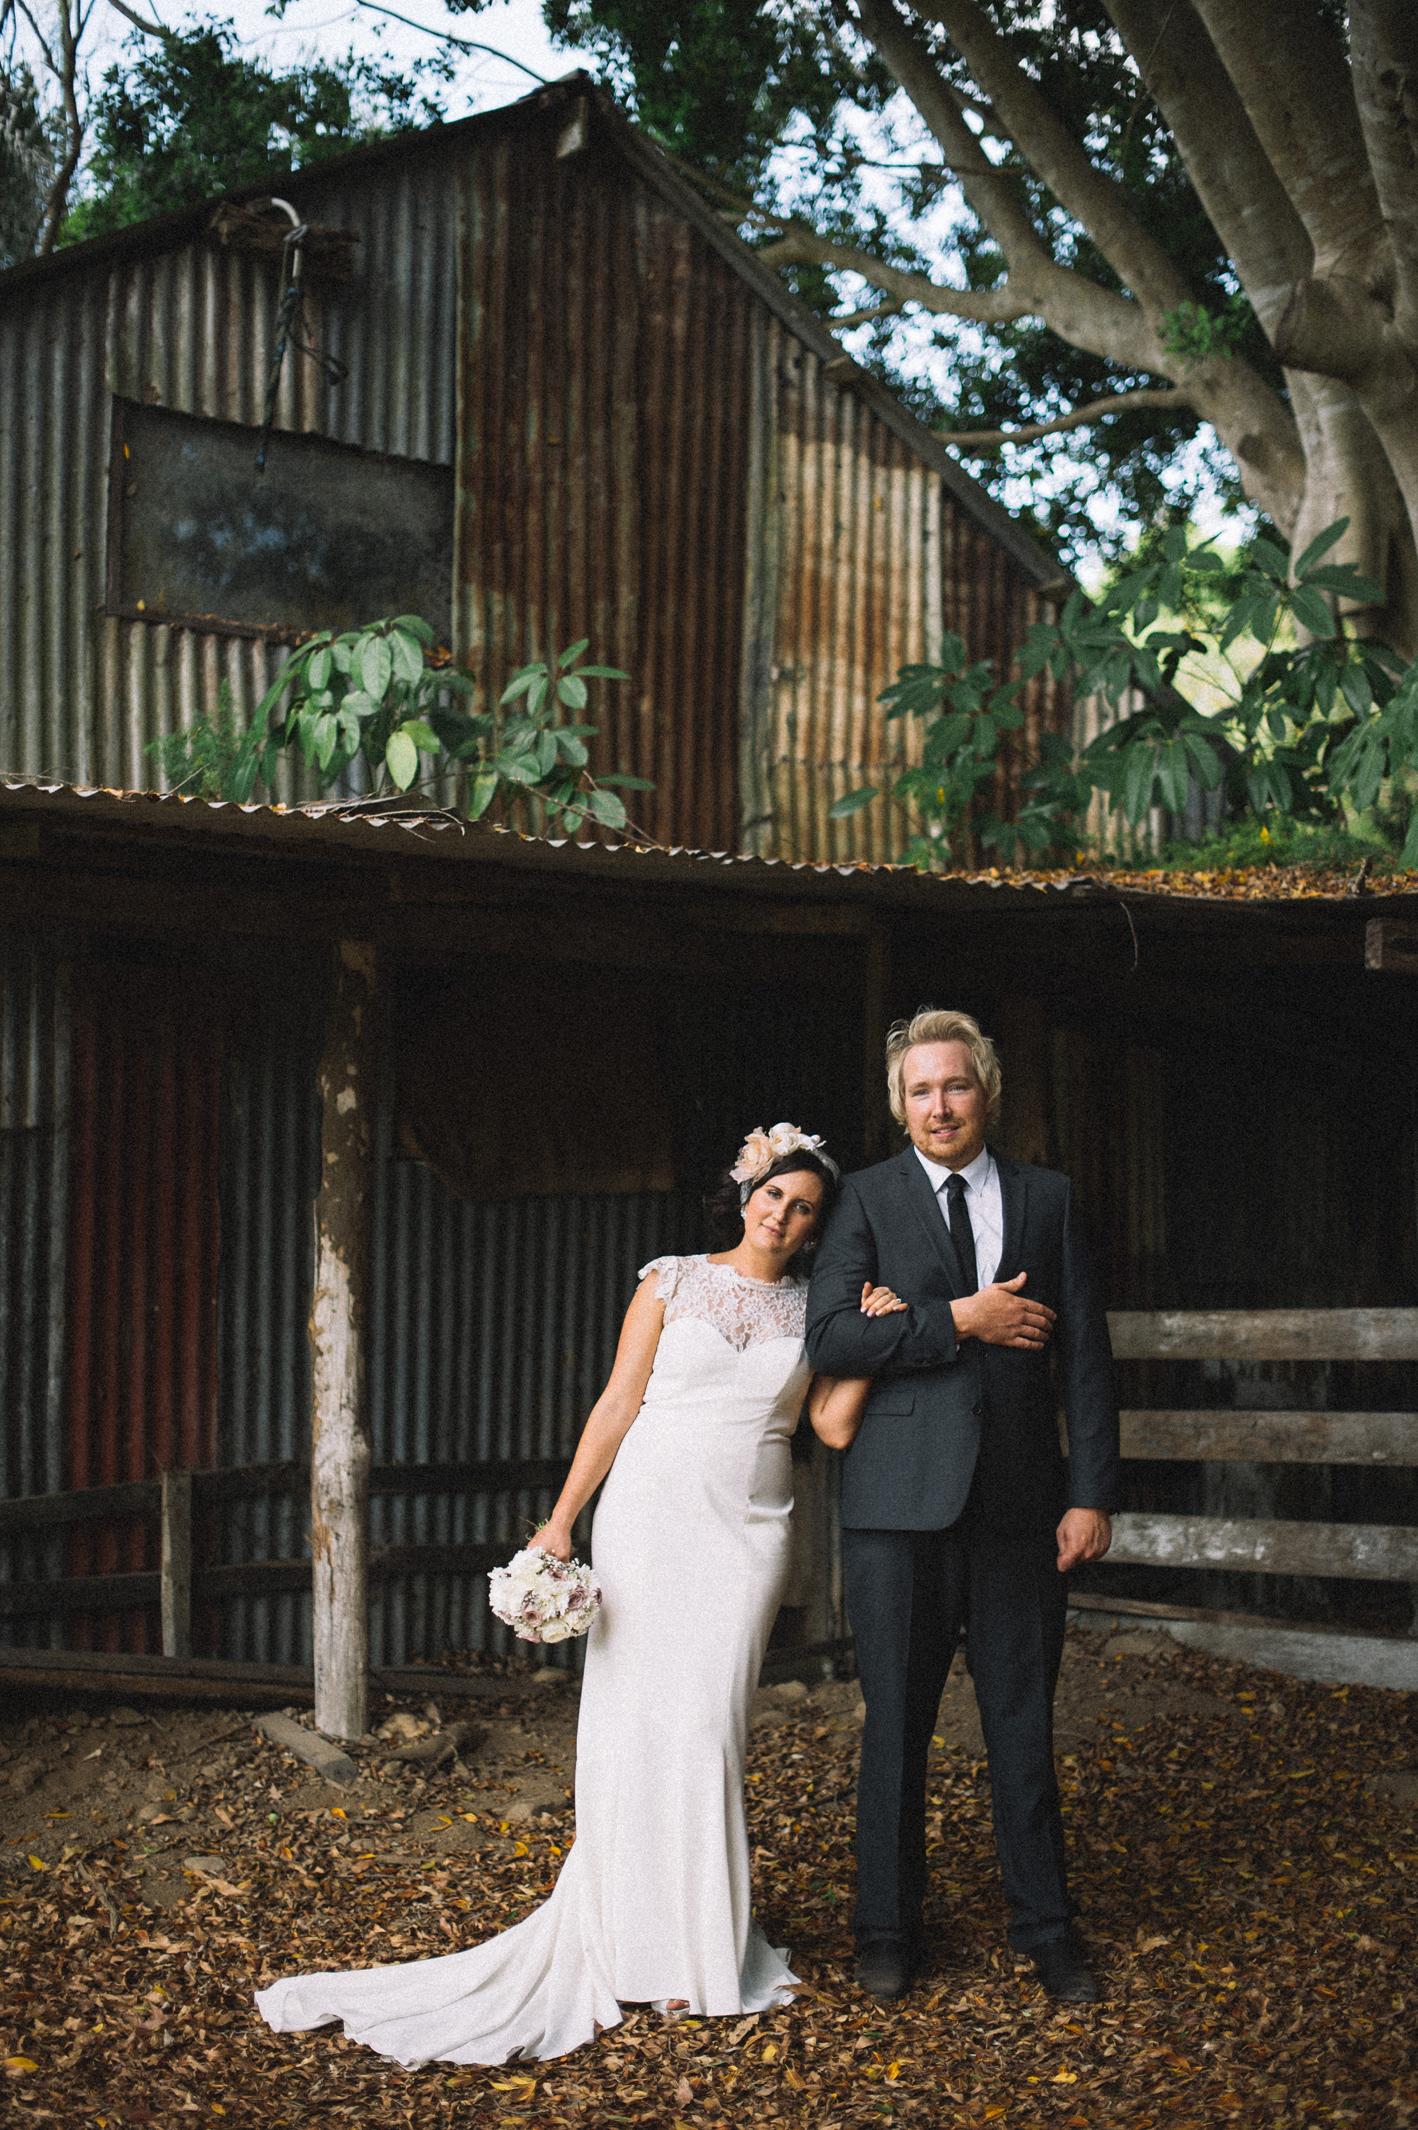 067-hannah-daniel-boomerang-farm-wedding-sophie-baker-photography